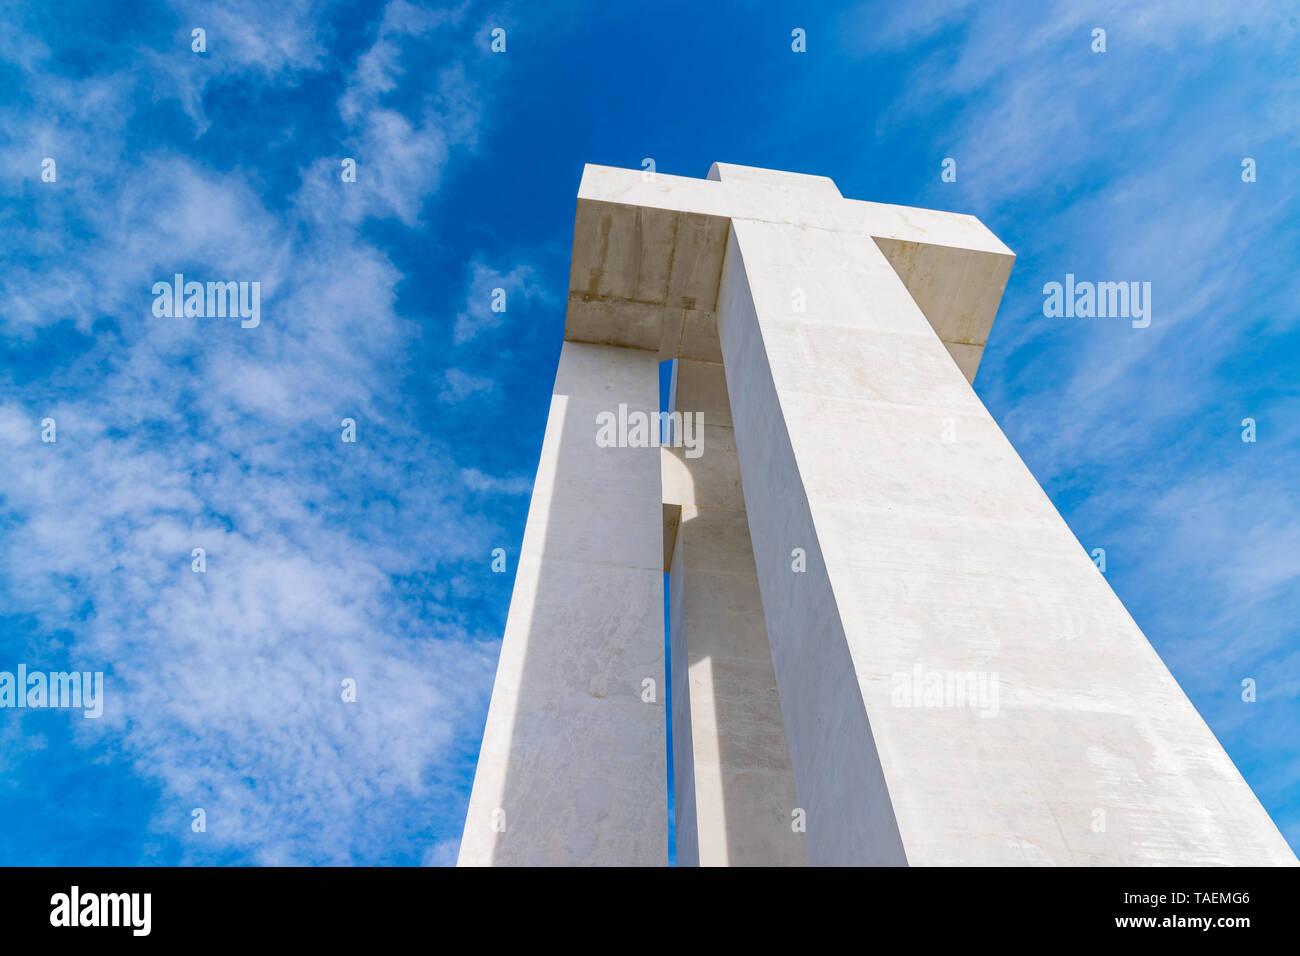 ALBA IULIA, ROMANIA - February 28, 2019: Monument of the Great Union in Alba Iulia, Romania. Stock Photo